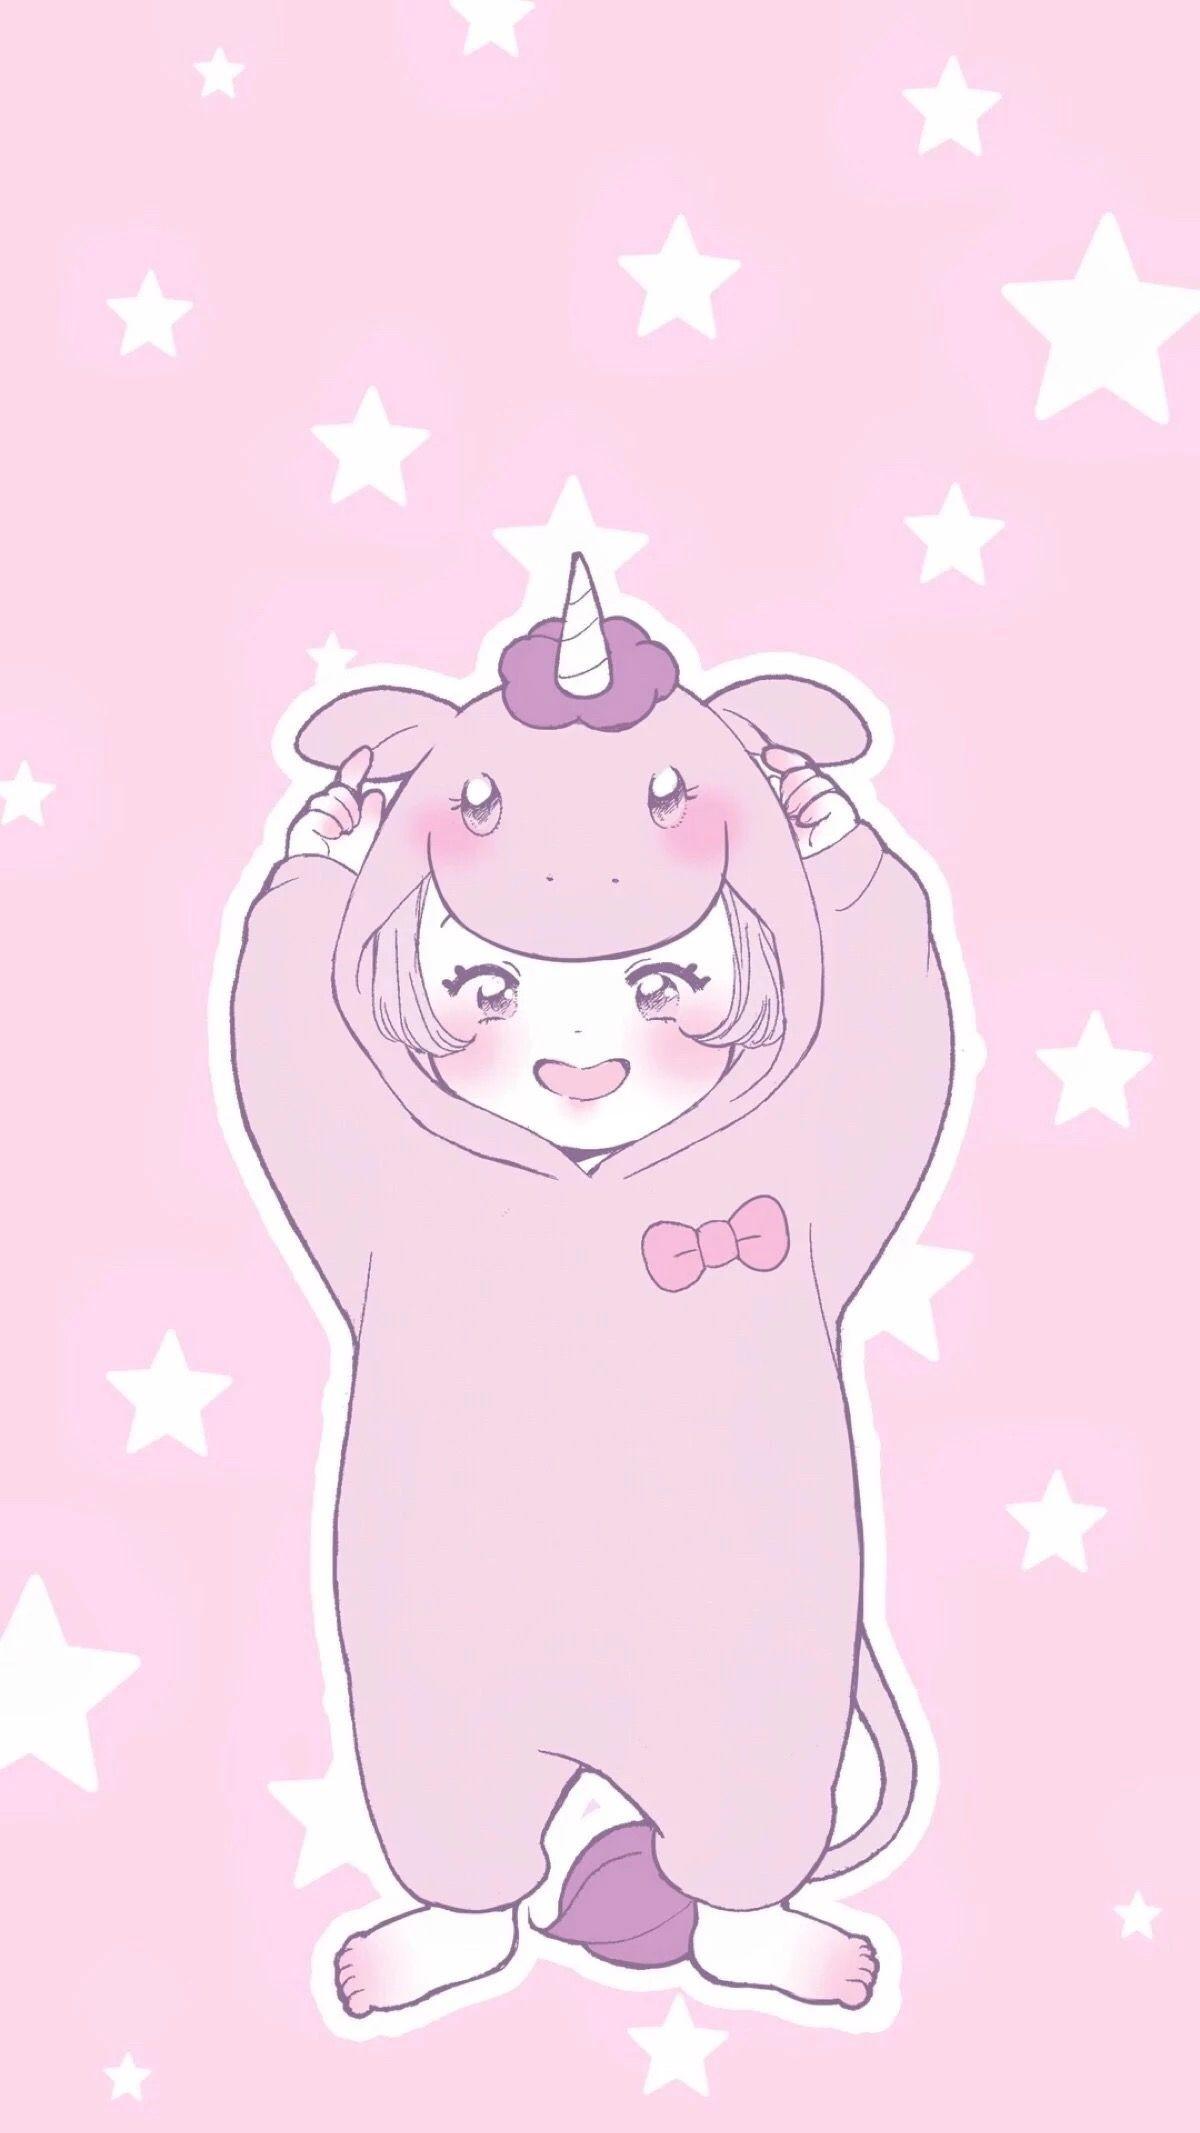 Res: 1200x2133, Kawaii Cute, Kawaii Anime, Kawaii Wallpaper, Pastel, Tumblr Backgrounds,  Melted Crayons, Color Palettes